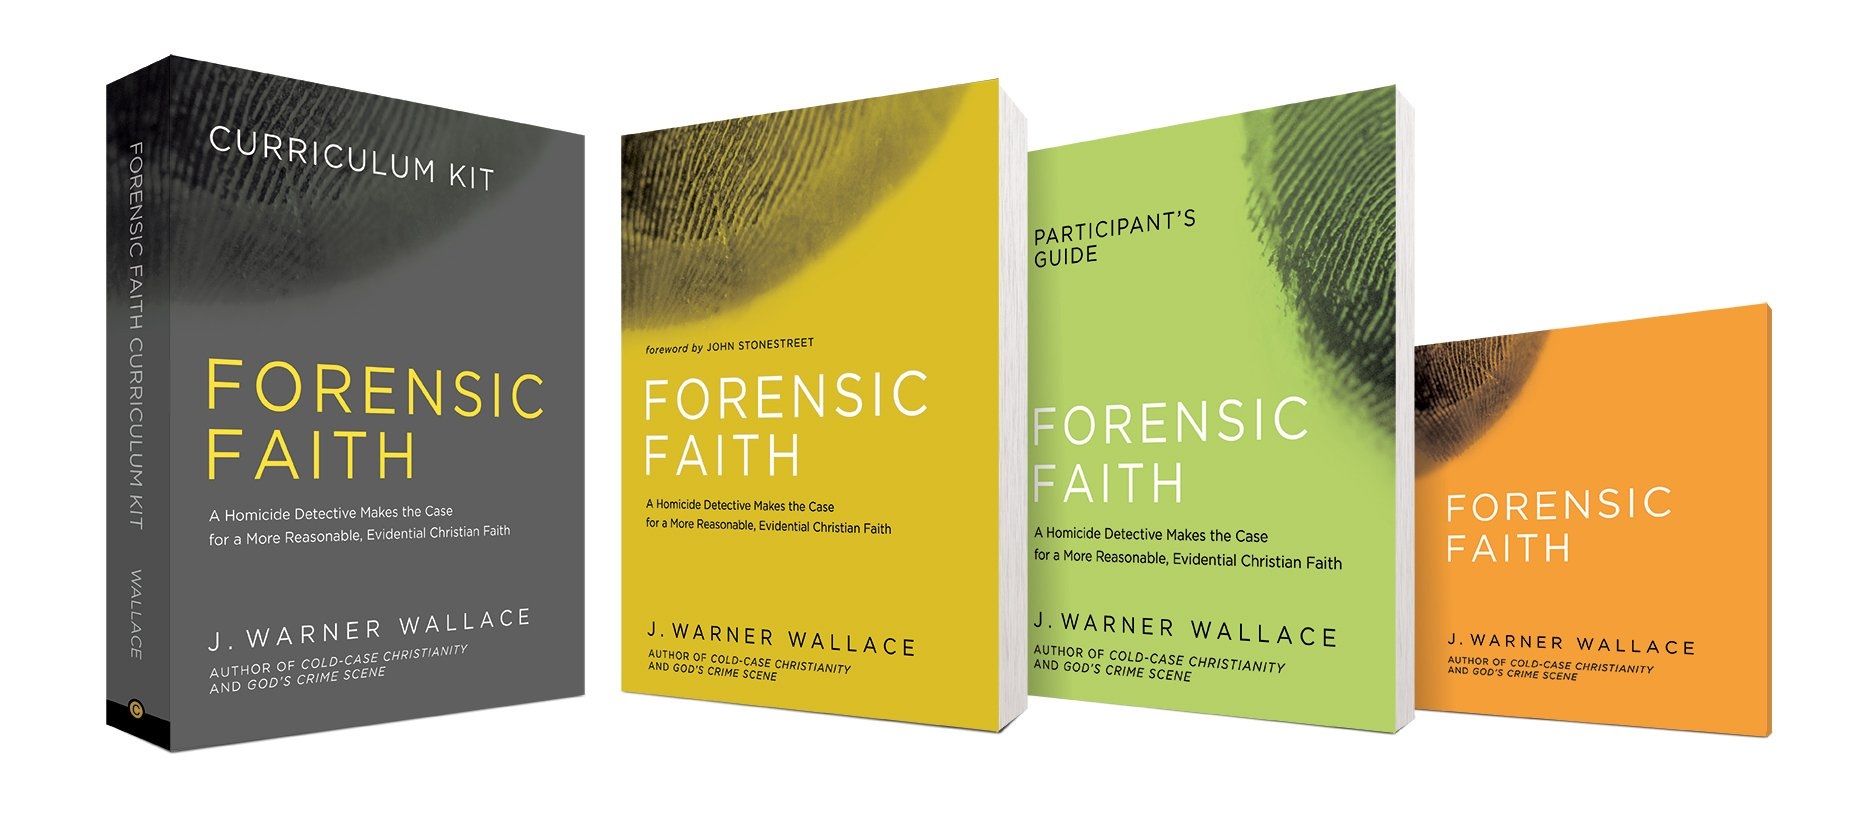 Forensic Faith Curriculum Kit: A Homicide Detective Makes the Case for a More Reasonable, Evidential Christian Faith